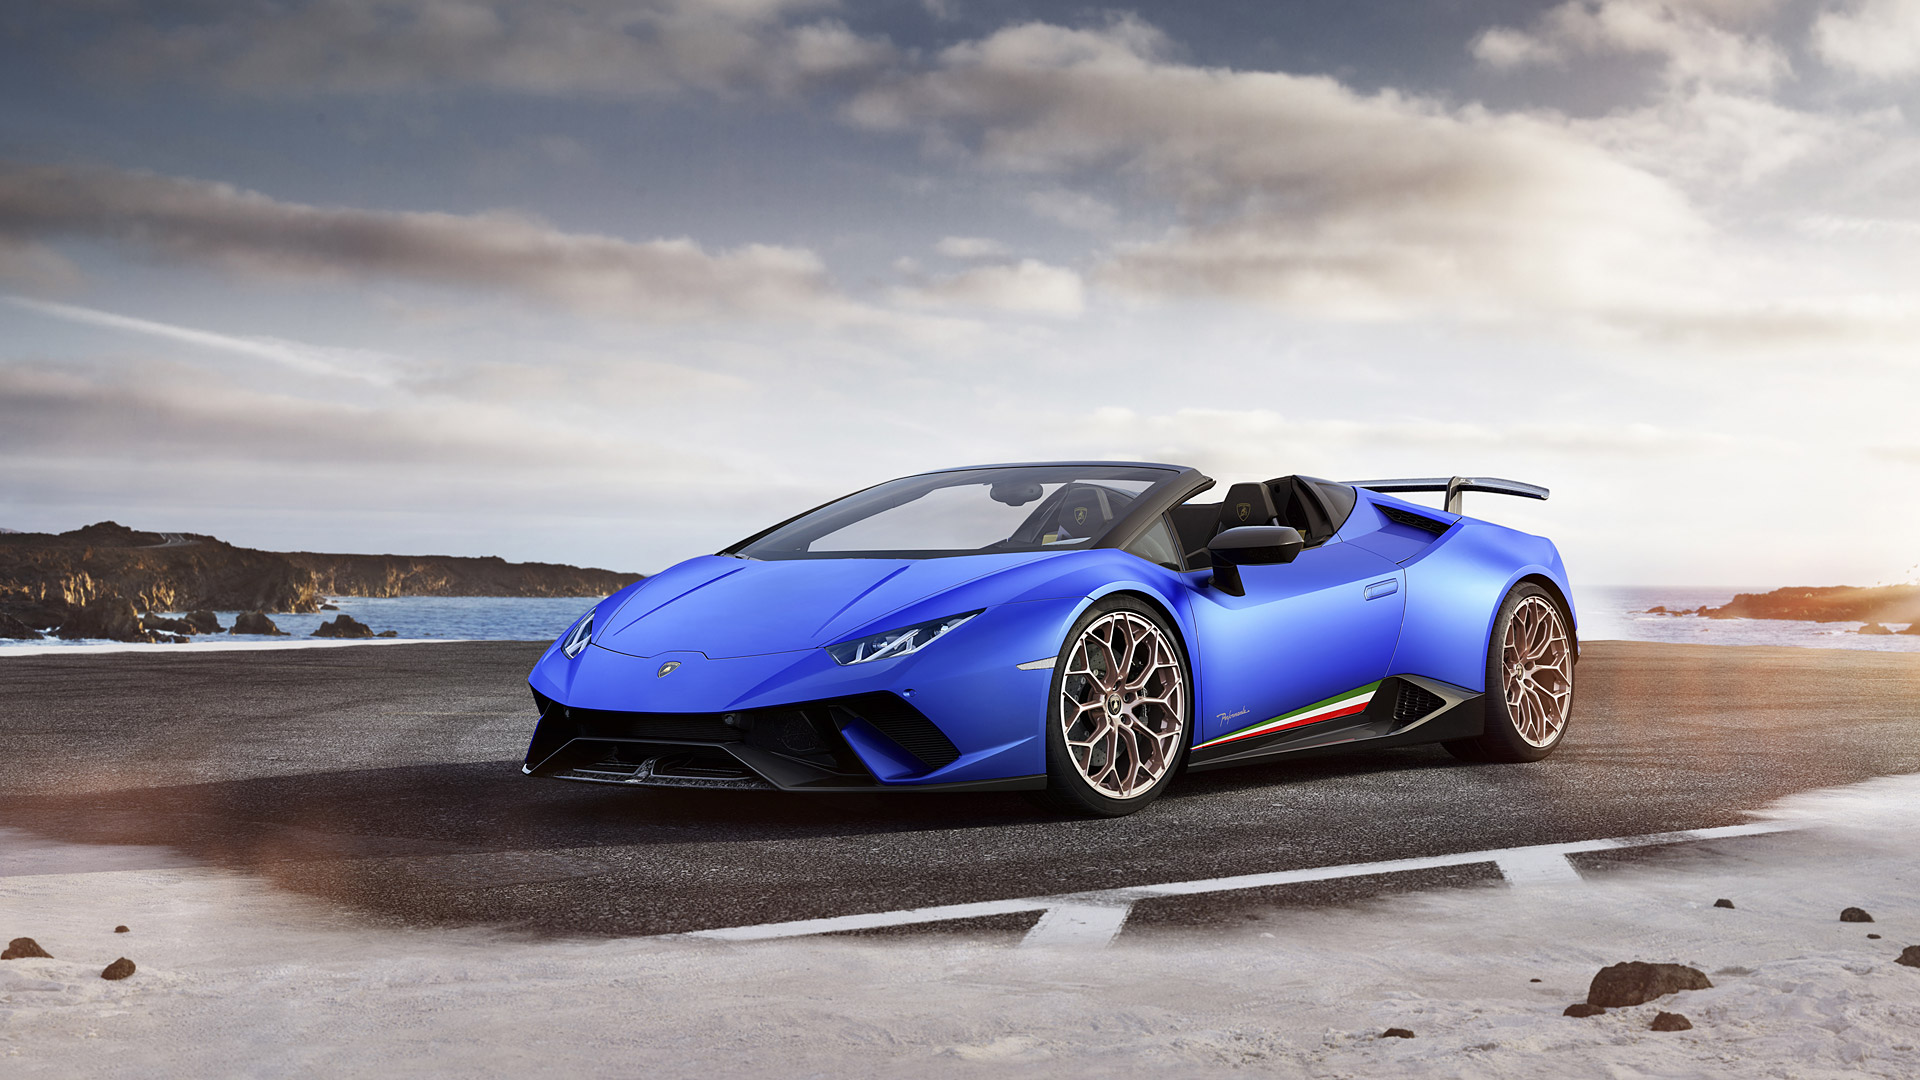 29 Lamborghini Huracán Spyder Performante Wallpapers On